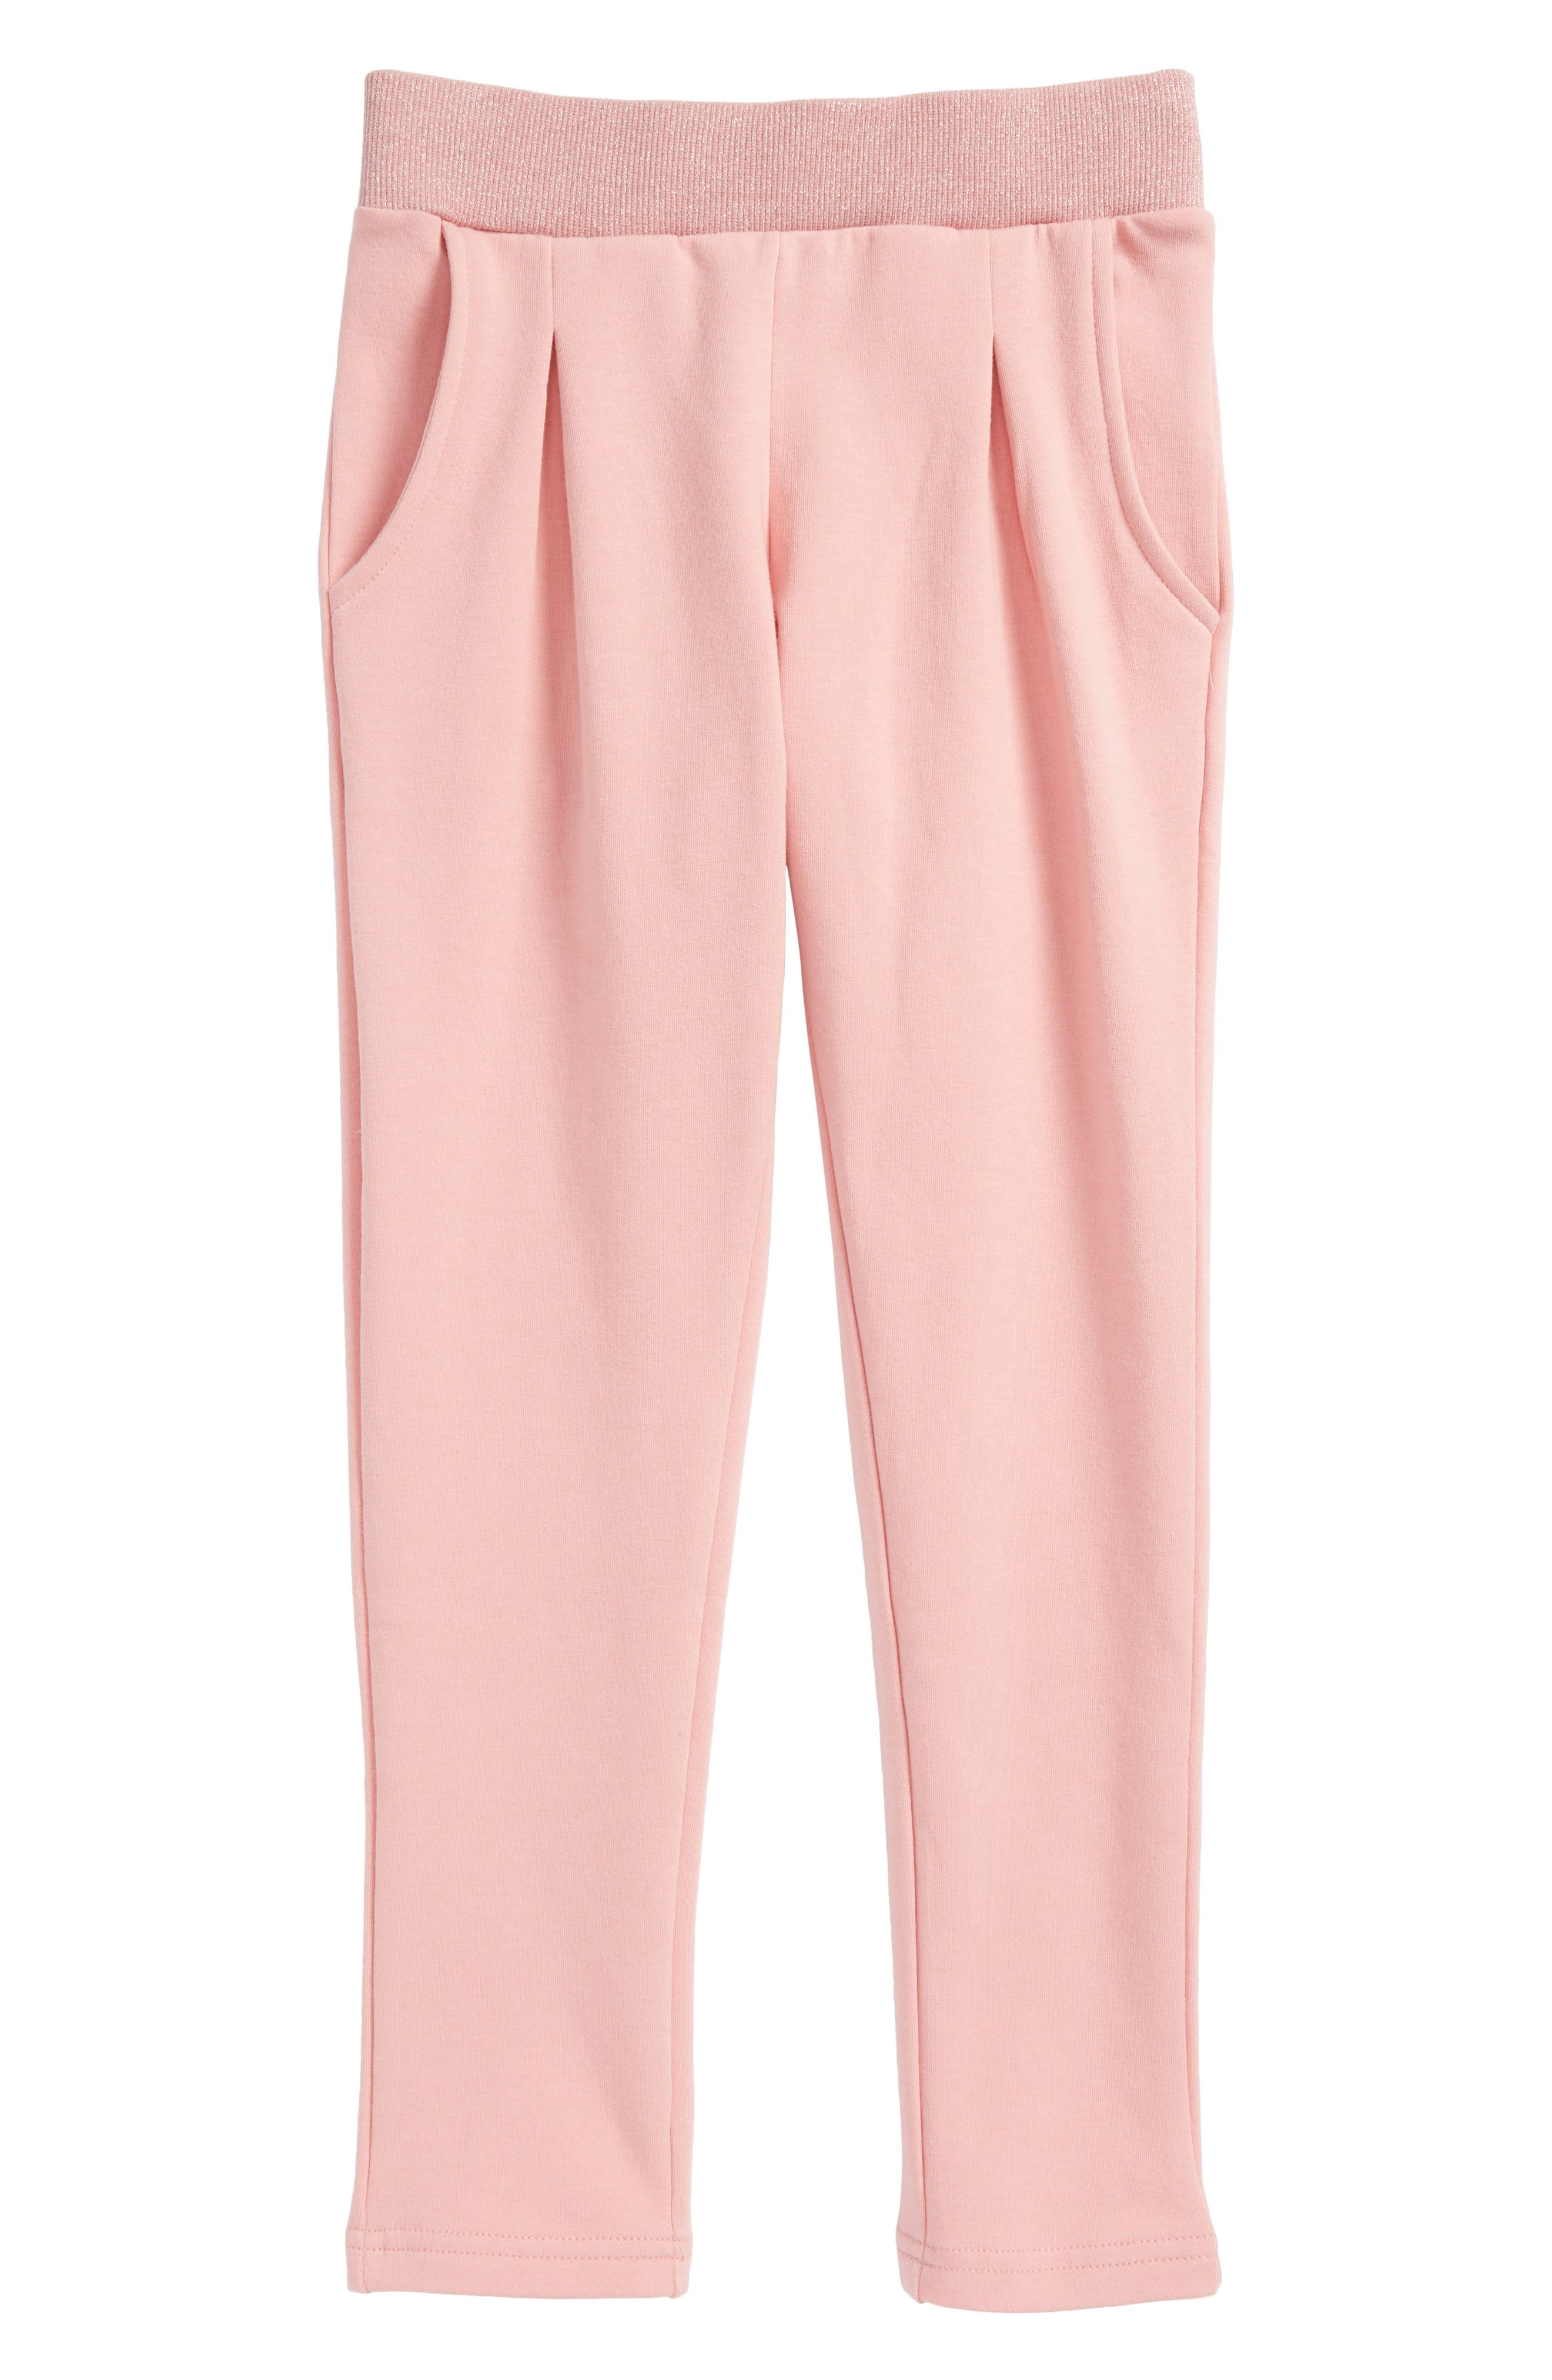 Wheat Nille Sweatpants (Toddler Girls, Little Girls & Big Girls)